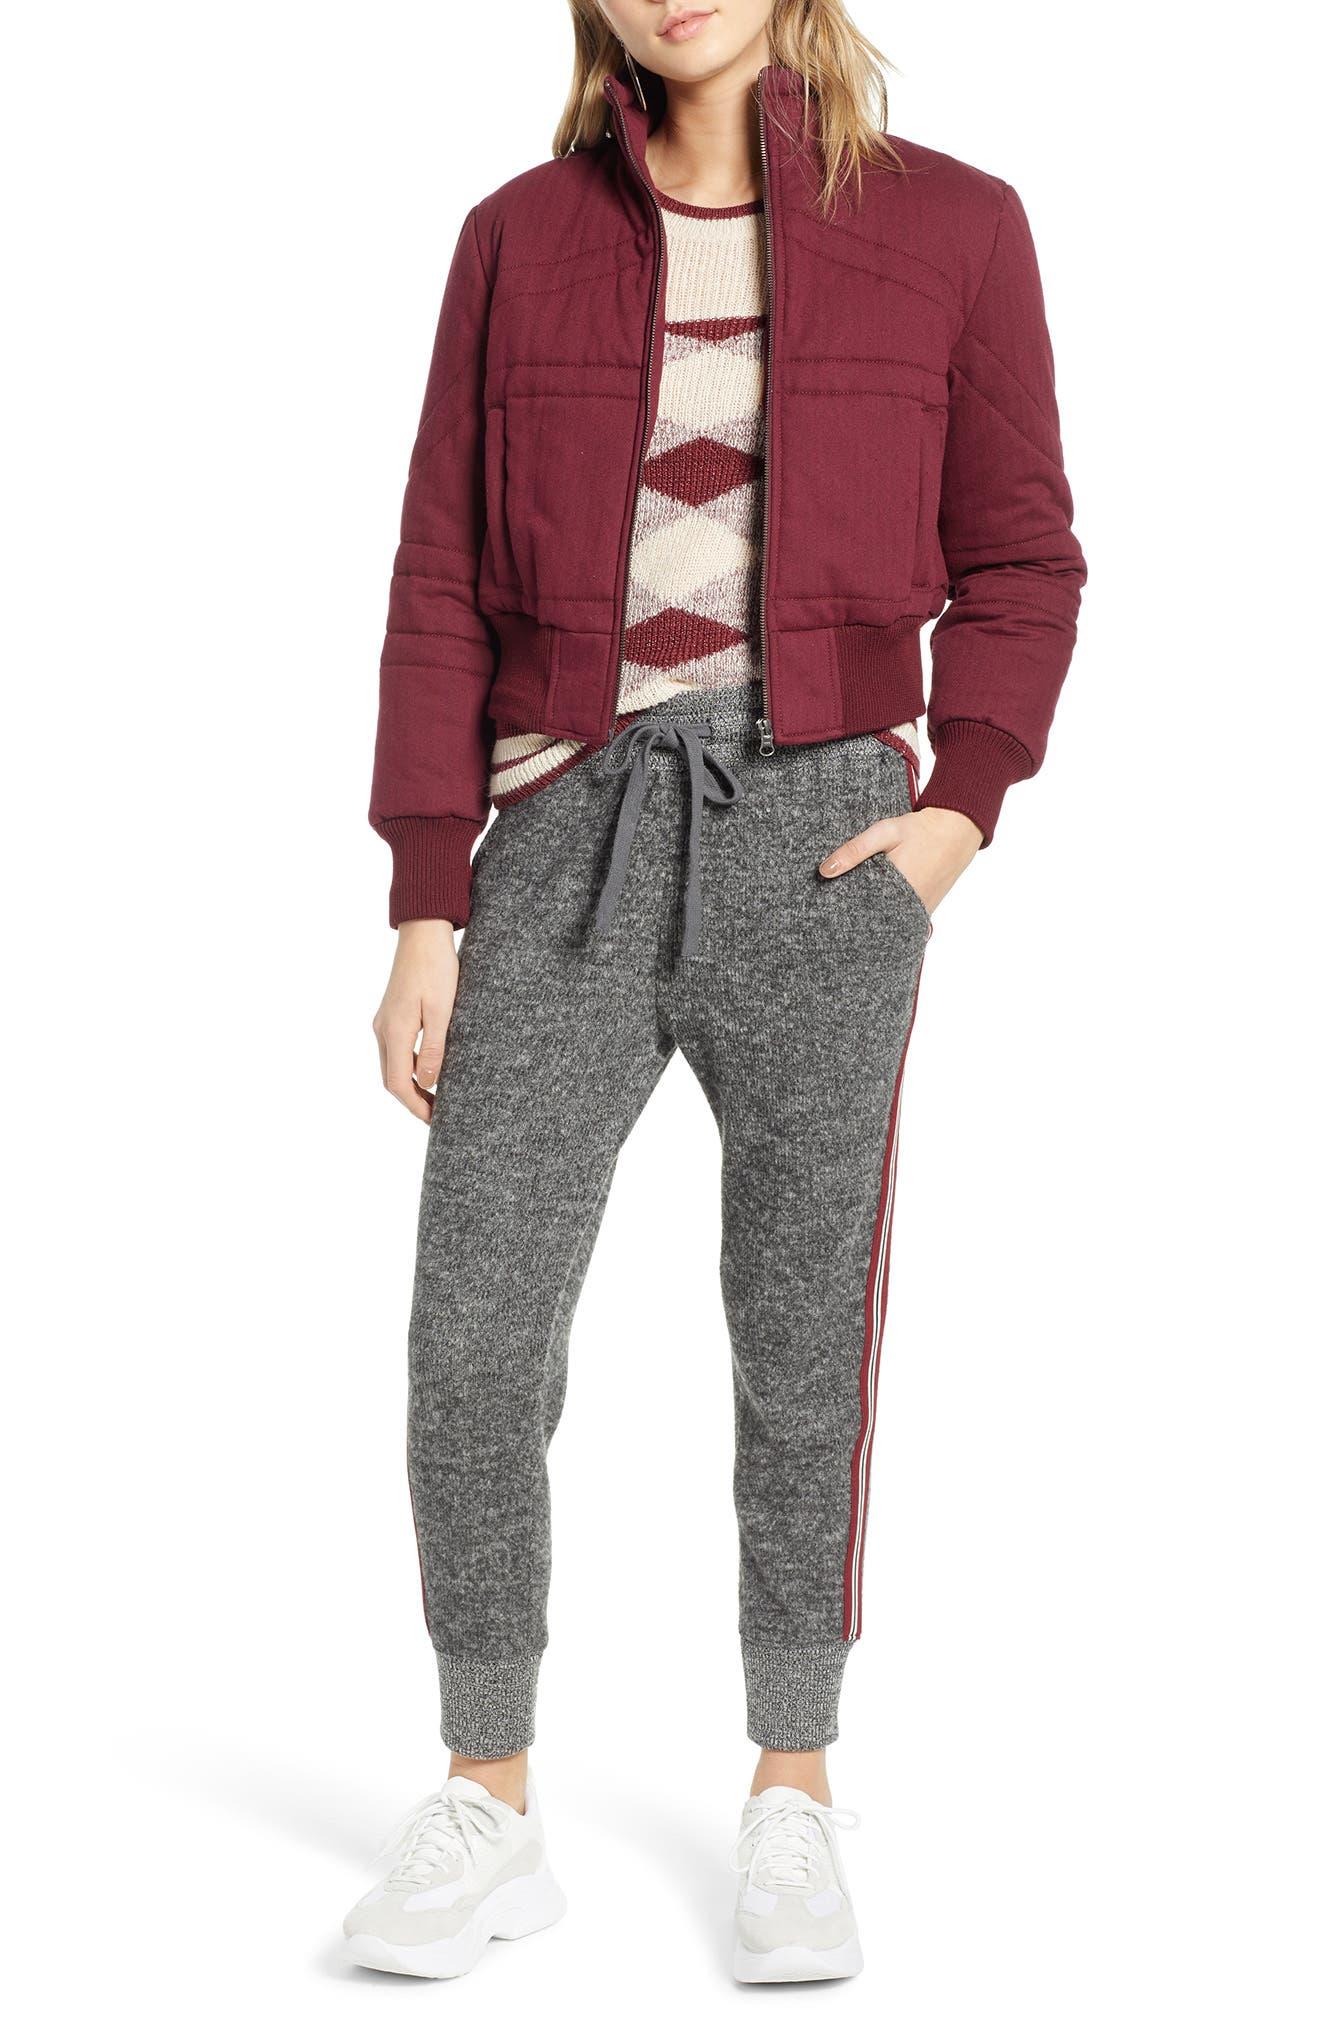 TREASURE & BOND, Flannel Crop Puffer Jacket, Alternate thumbnail 4, color, RED TANNIN HEATHER